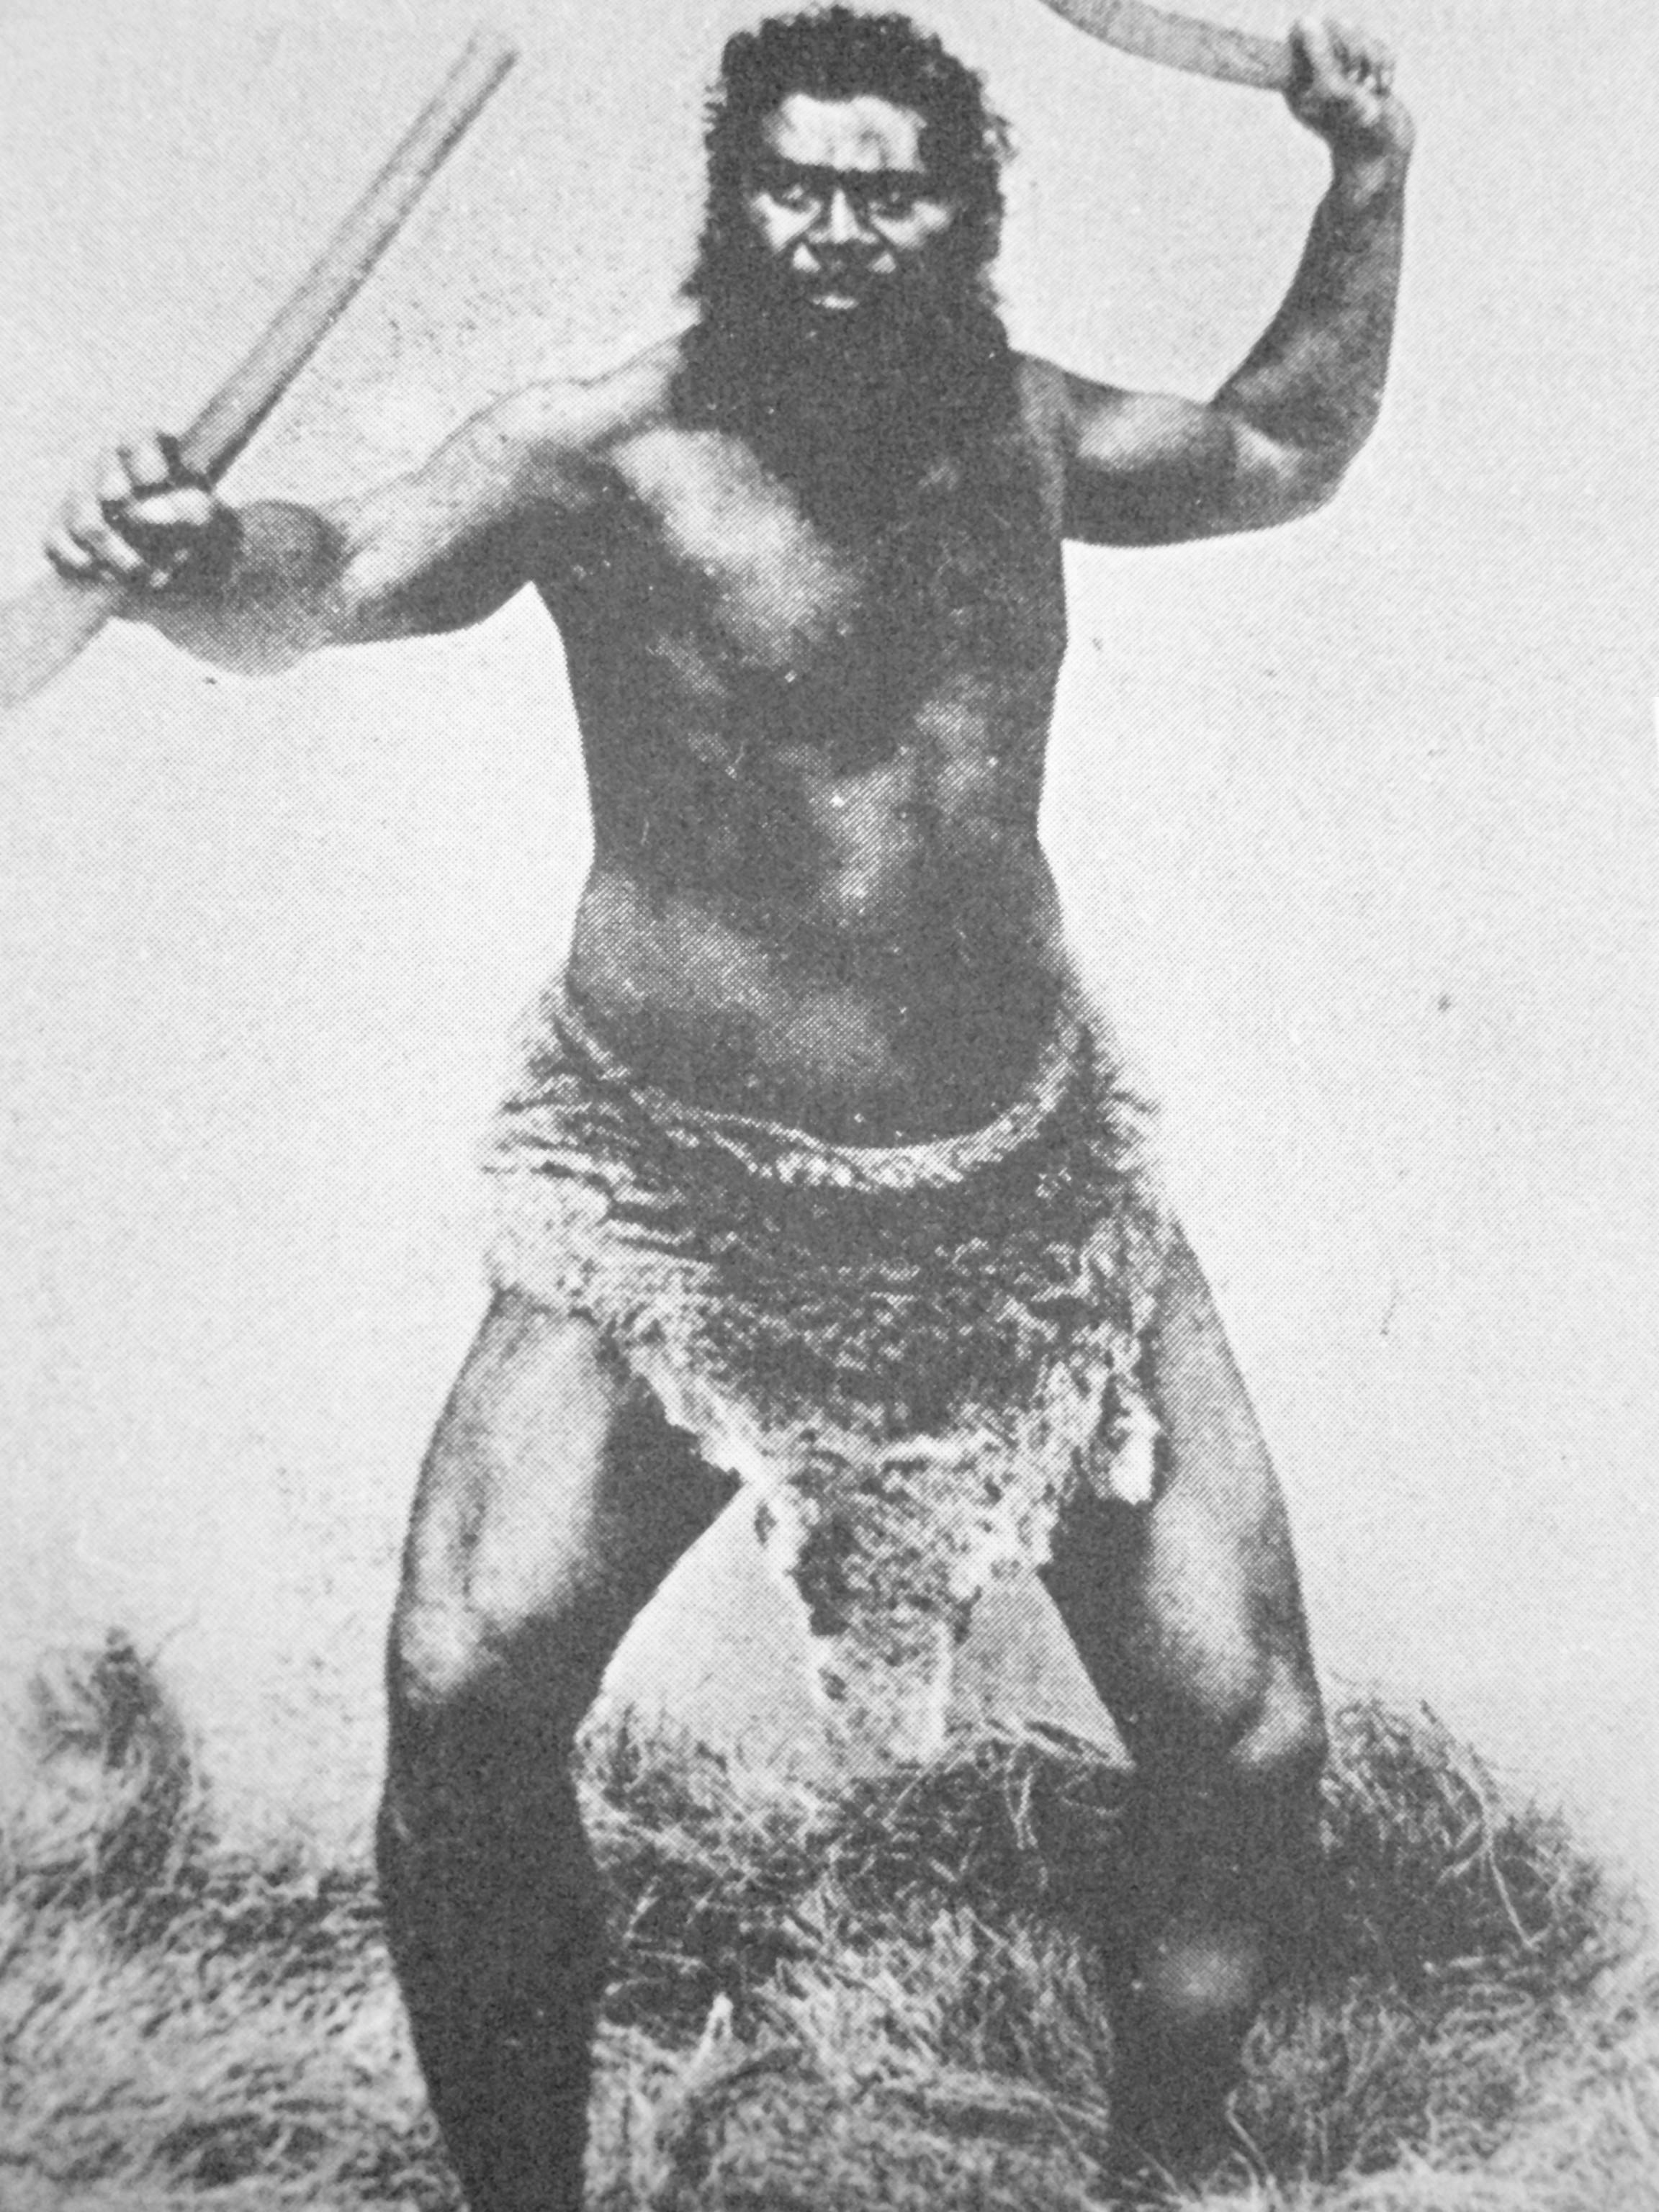 Guerrier aborigène lançant un boomerang.